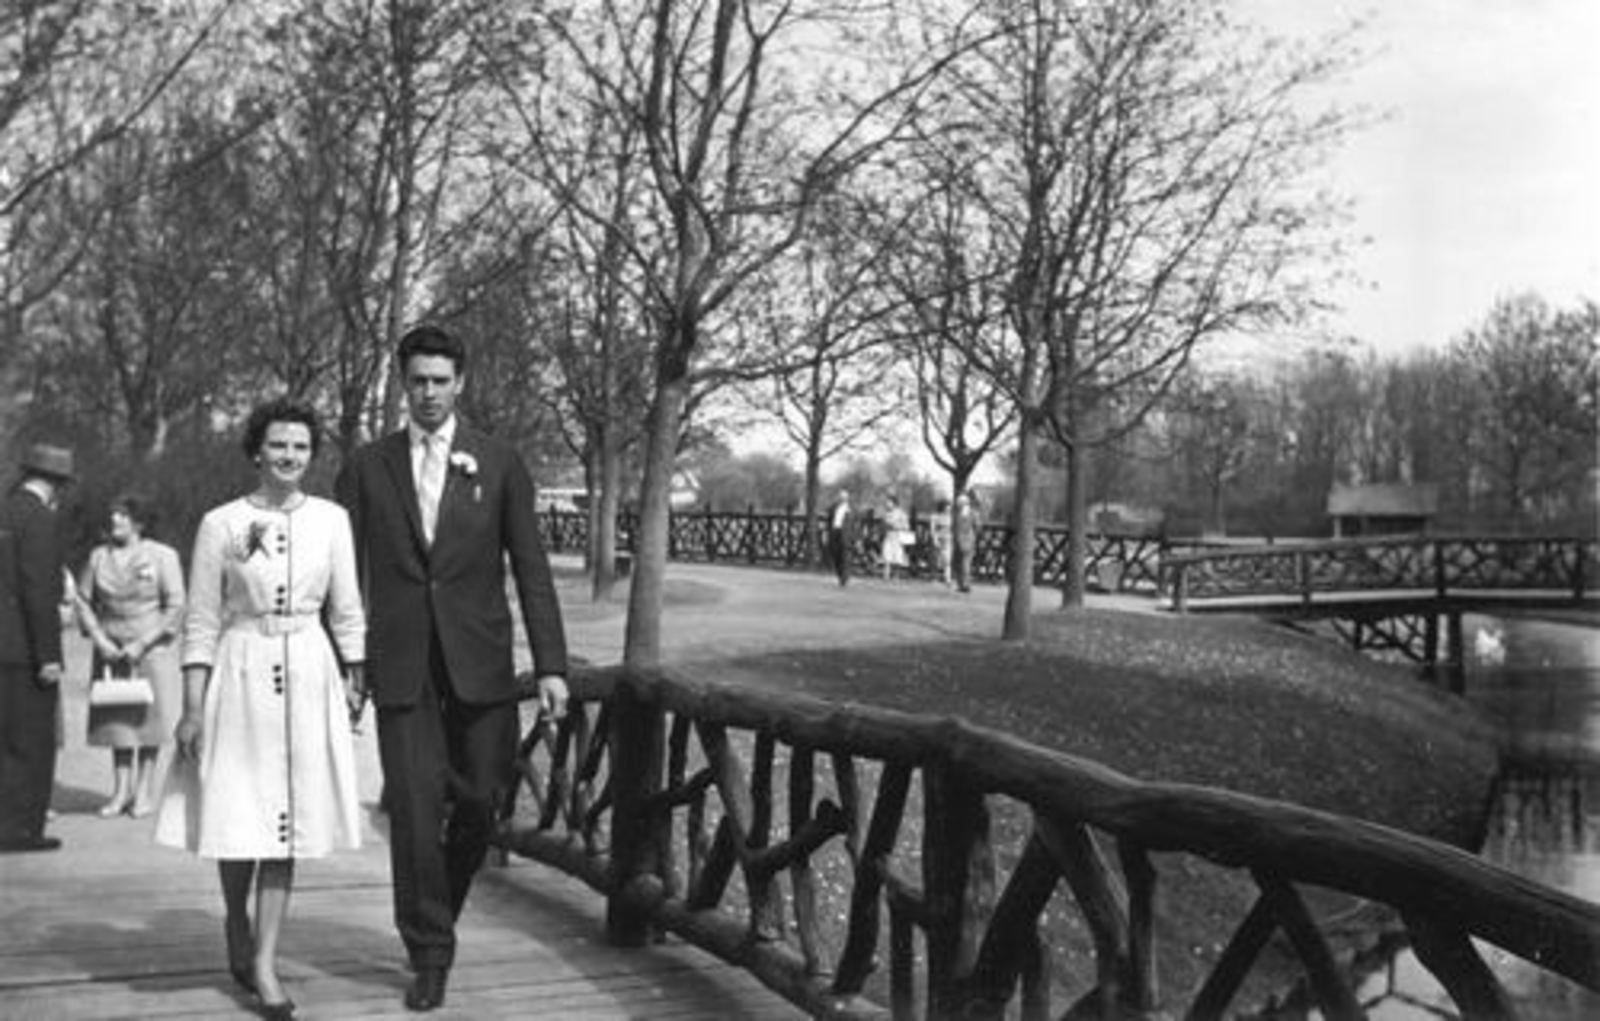 Boslaan 0000 Wandelbos 19__ Ria Koeckhoven trouwt Harry Leemkuil 01